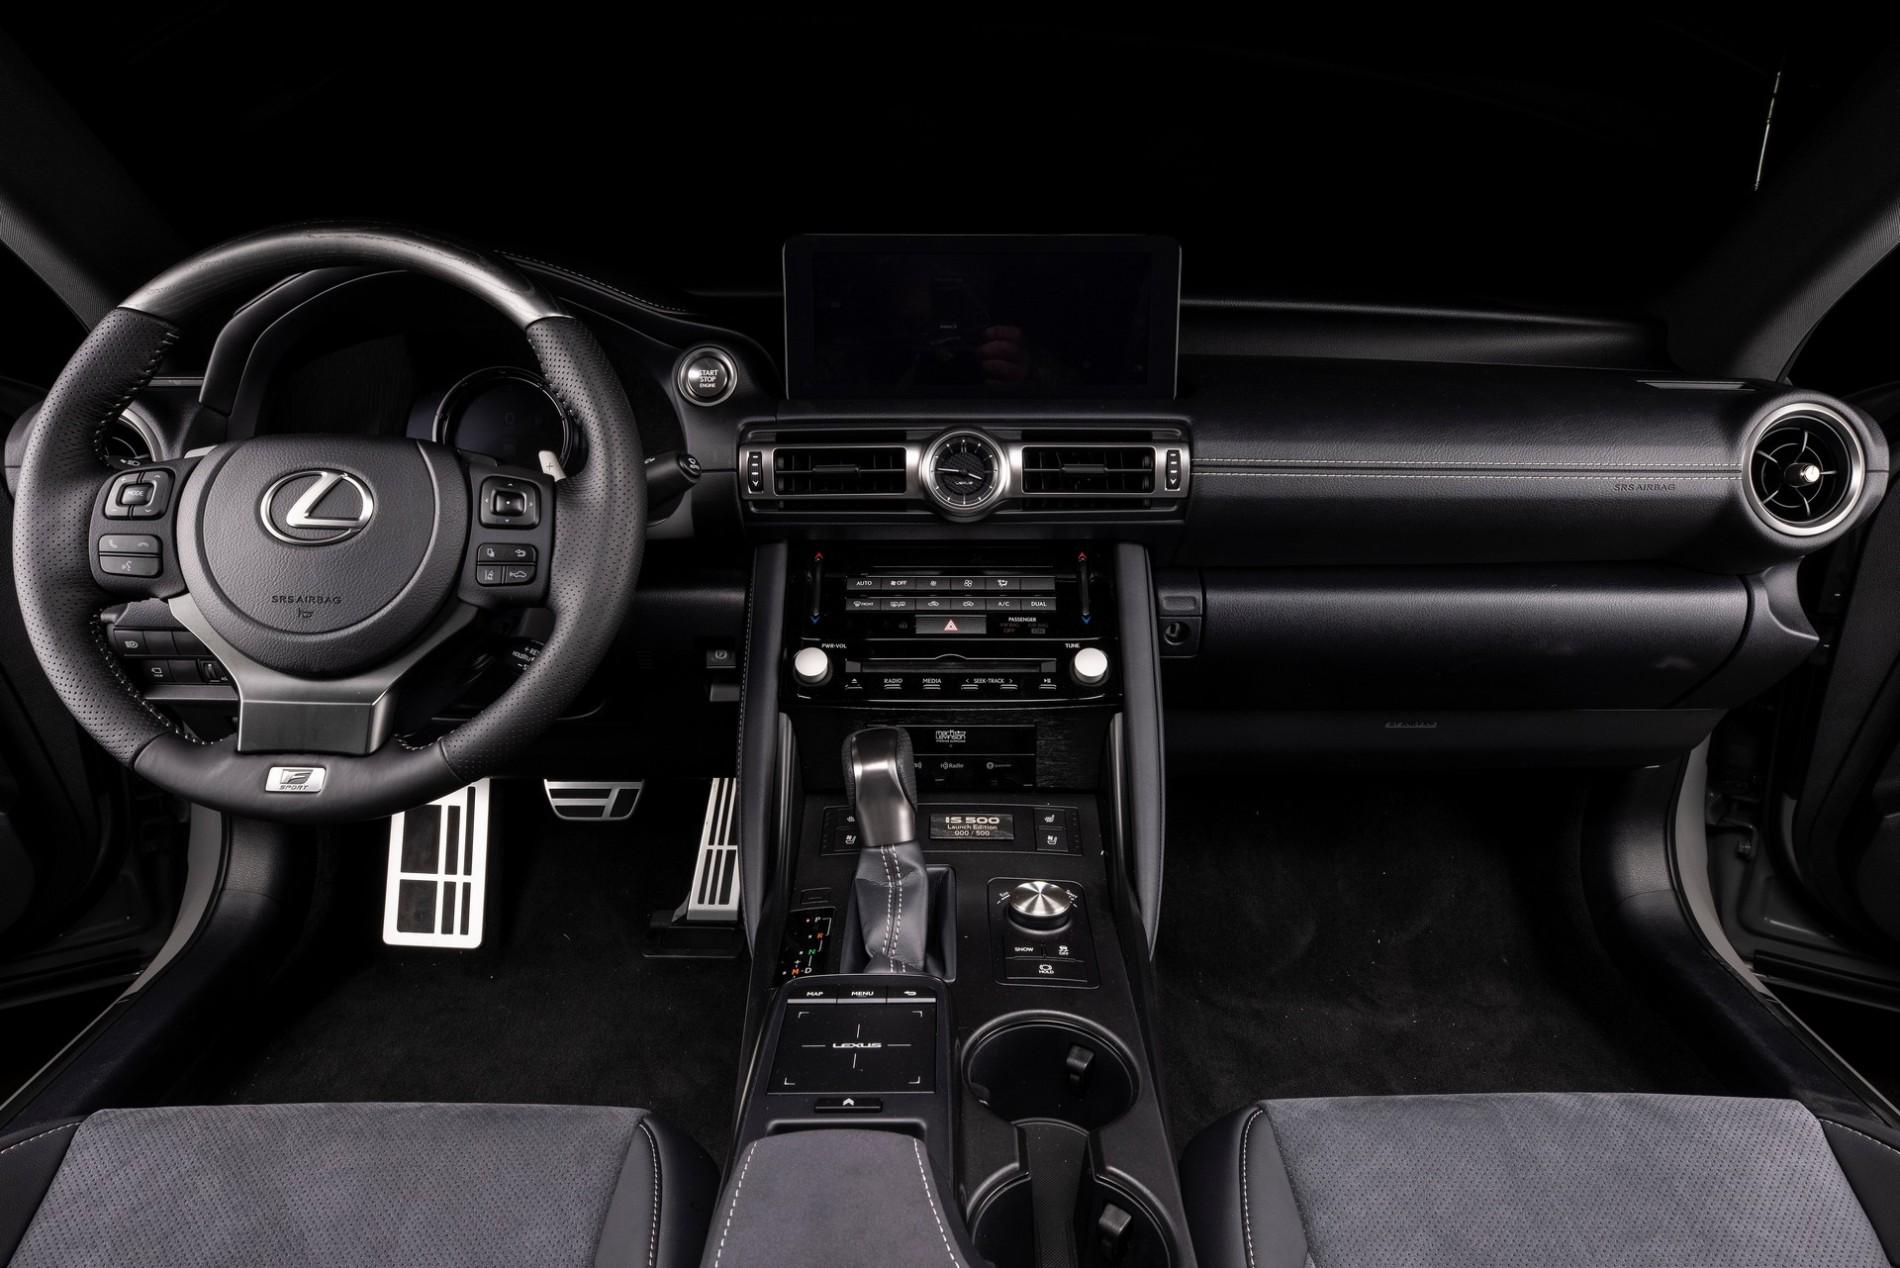 Lexus IS 500 F Sport Performance Launch Edition - Lexus IS 500 F Sport Performance Launch Edition